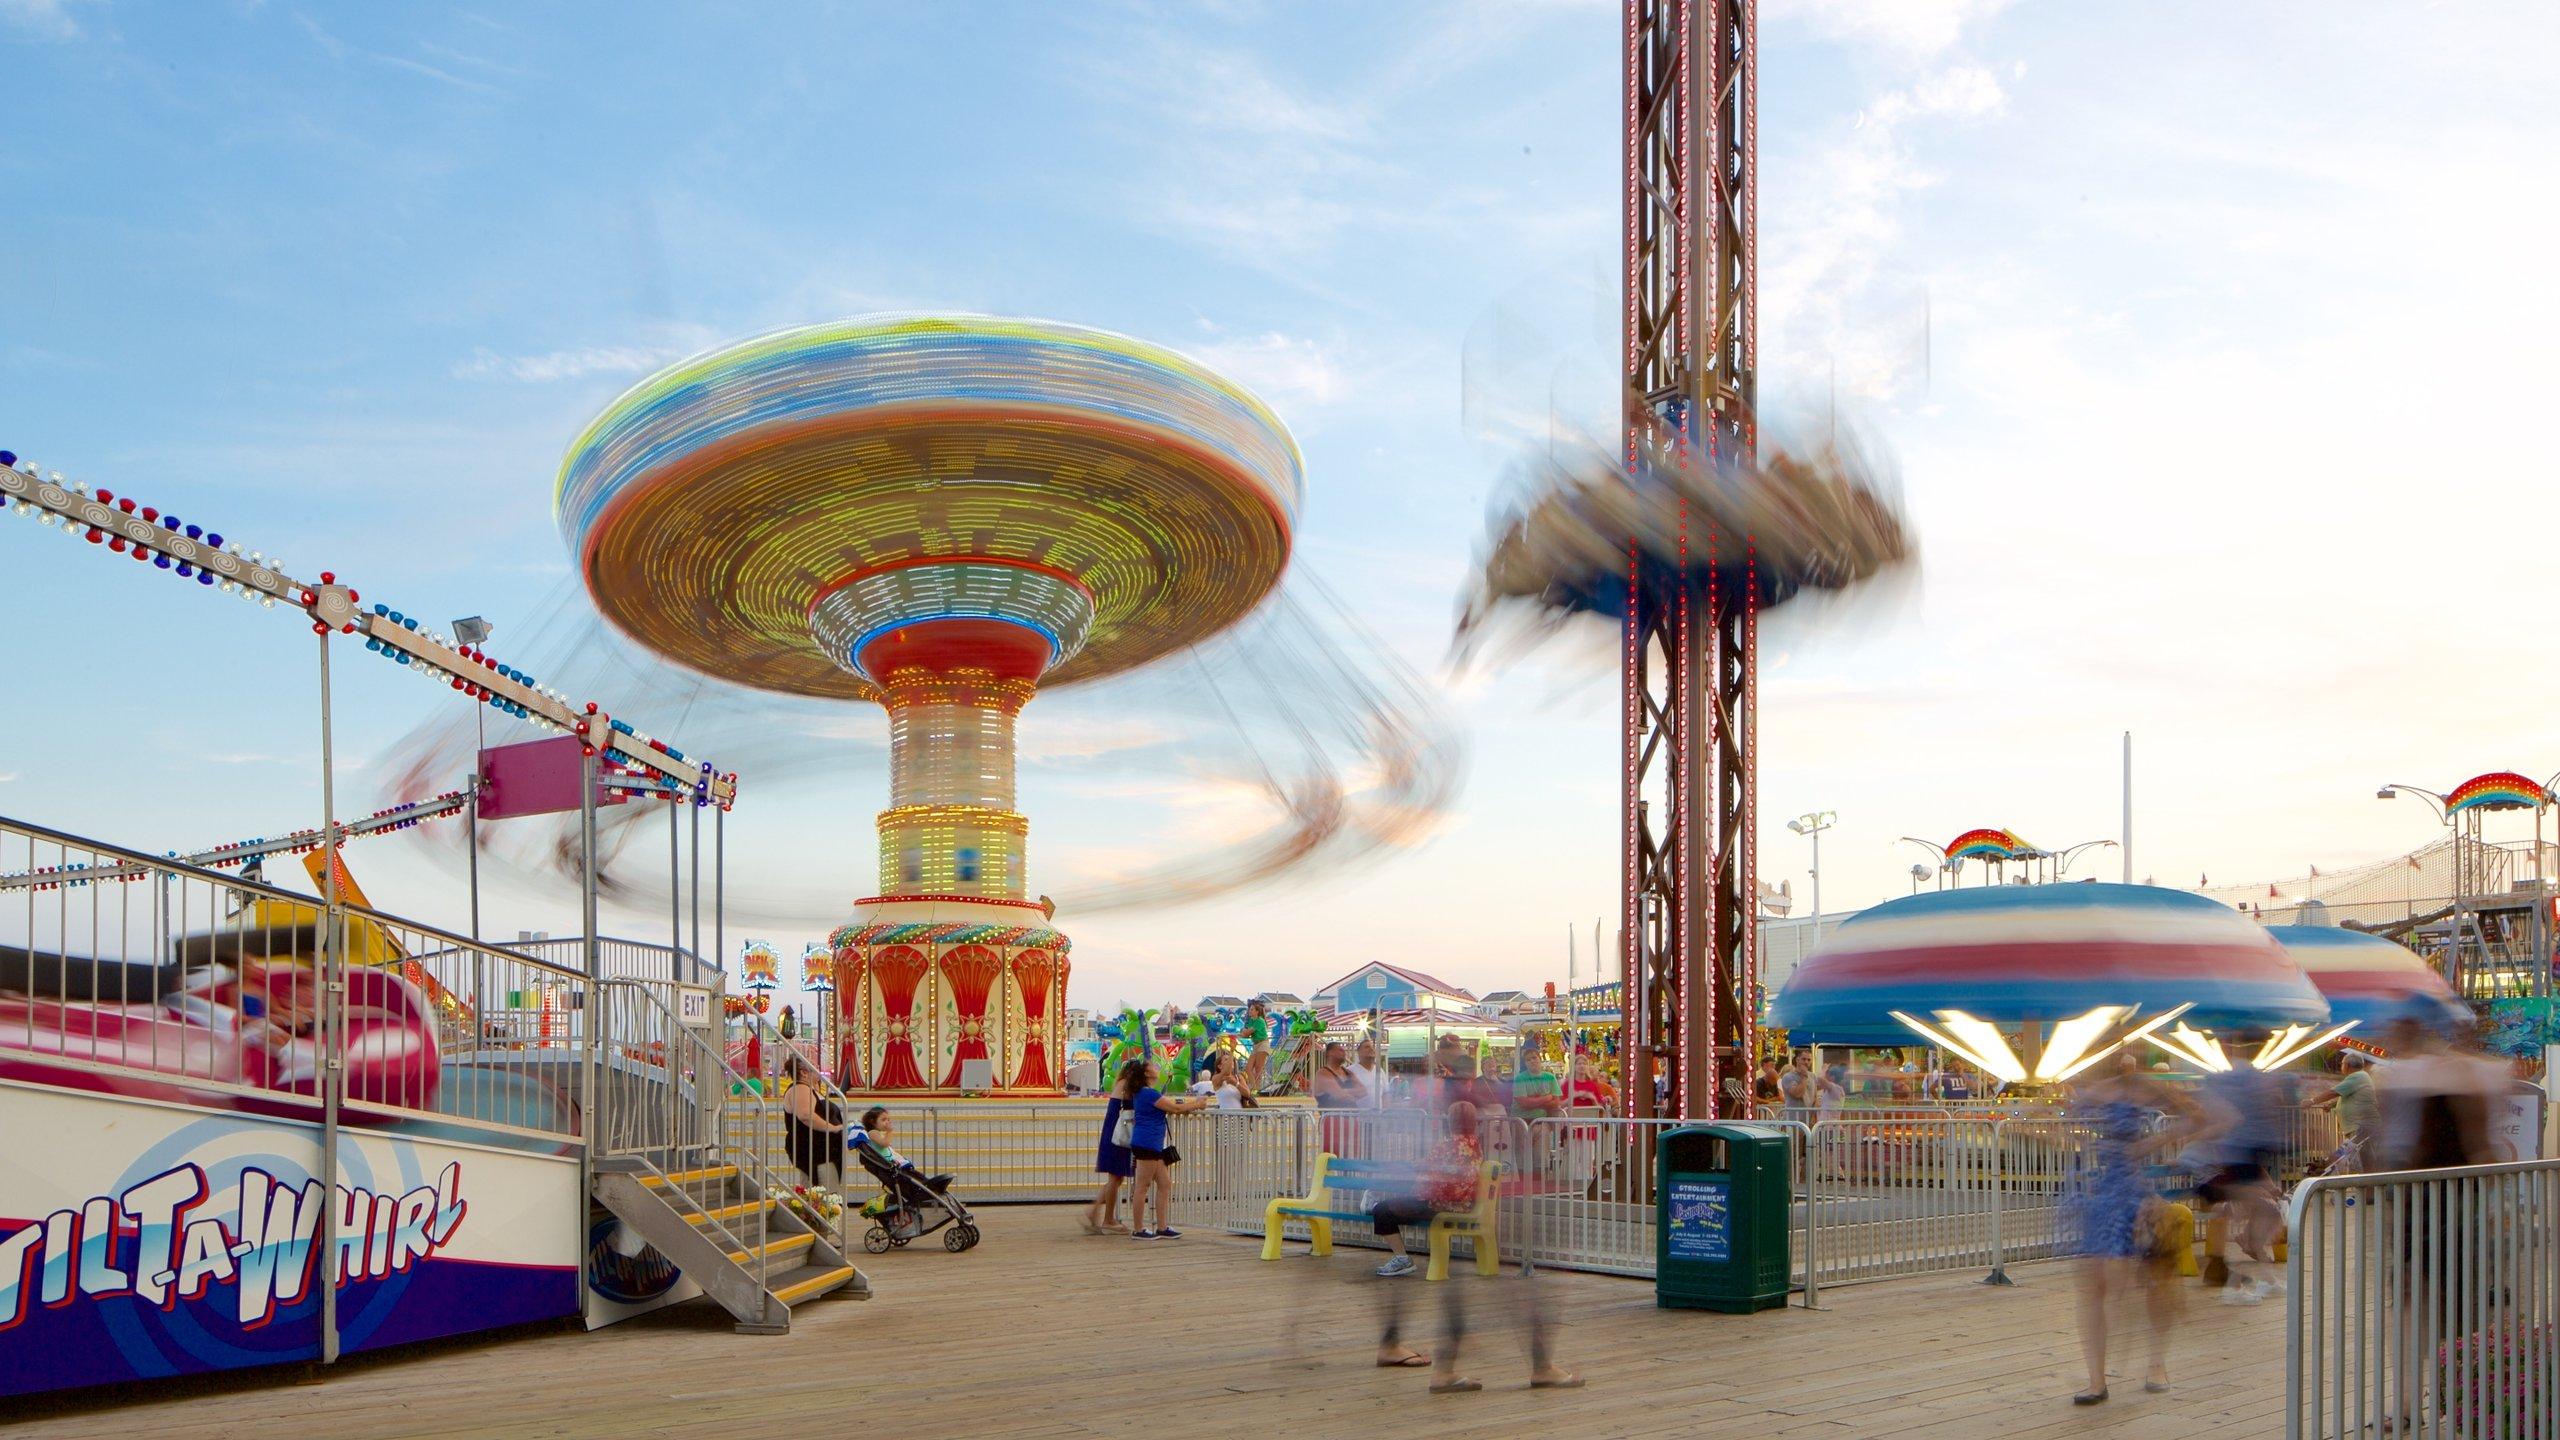 Casino Pier, Seaside Heights, New Jersey, Verenigde Staten